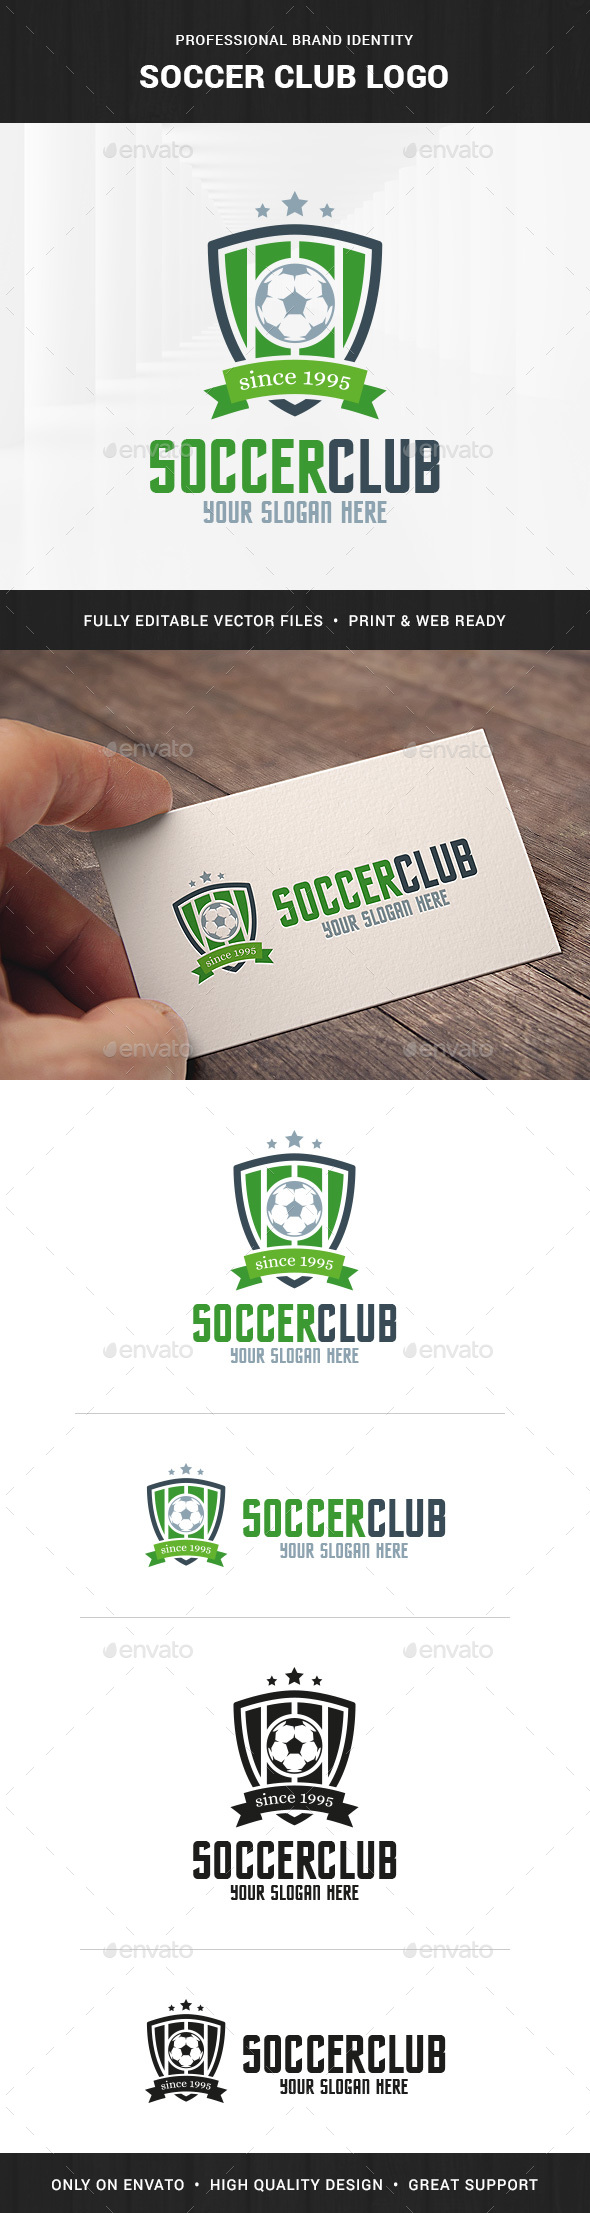 Soccer Club Logo Template